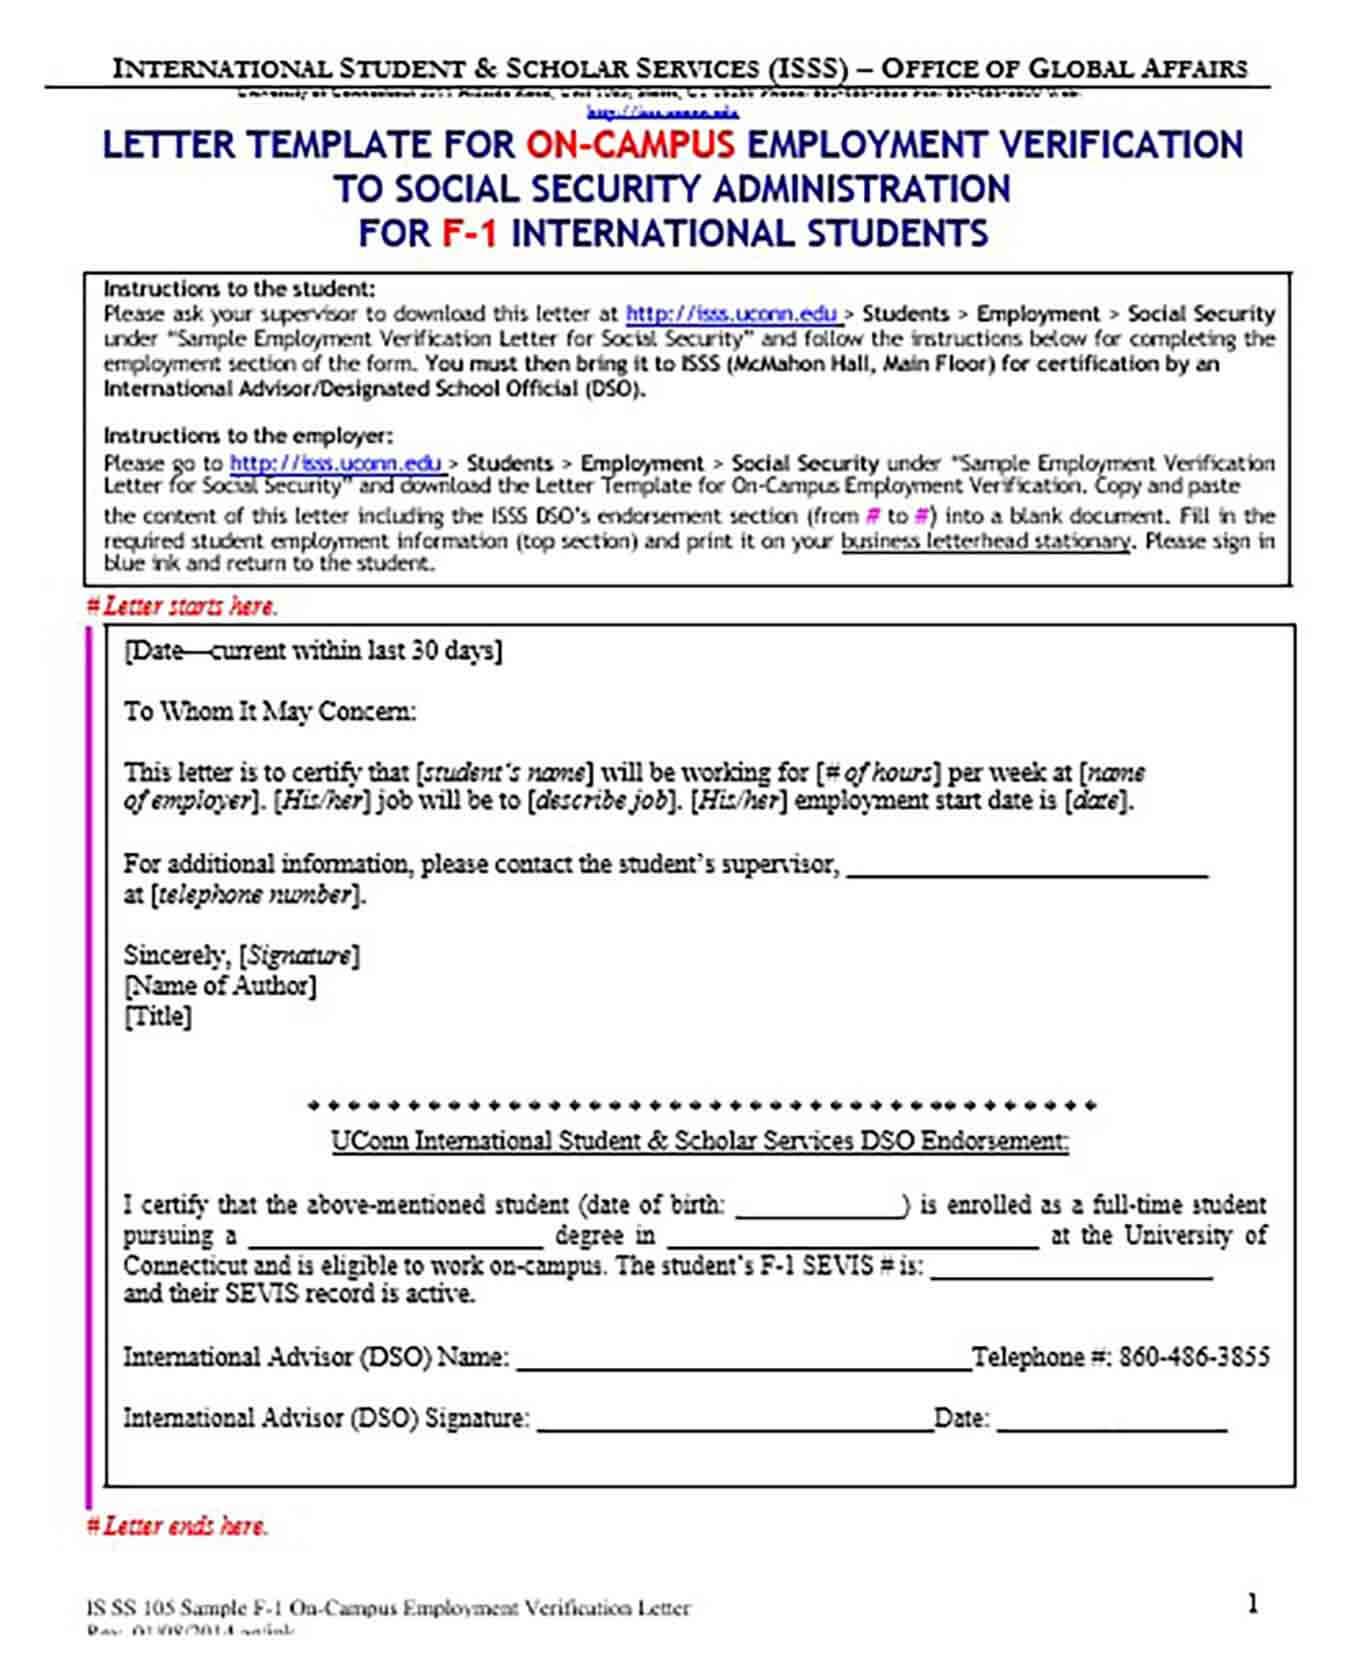 On Campus Employment Verification Letter